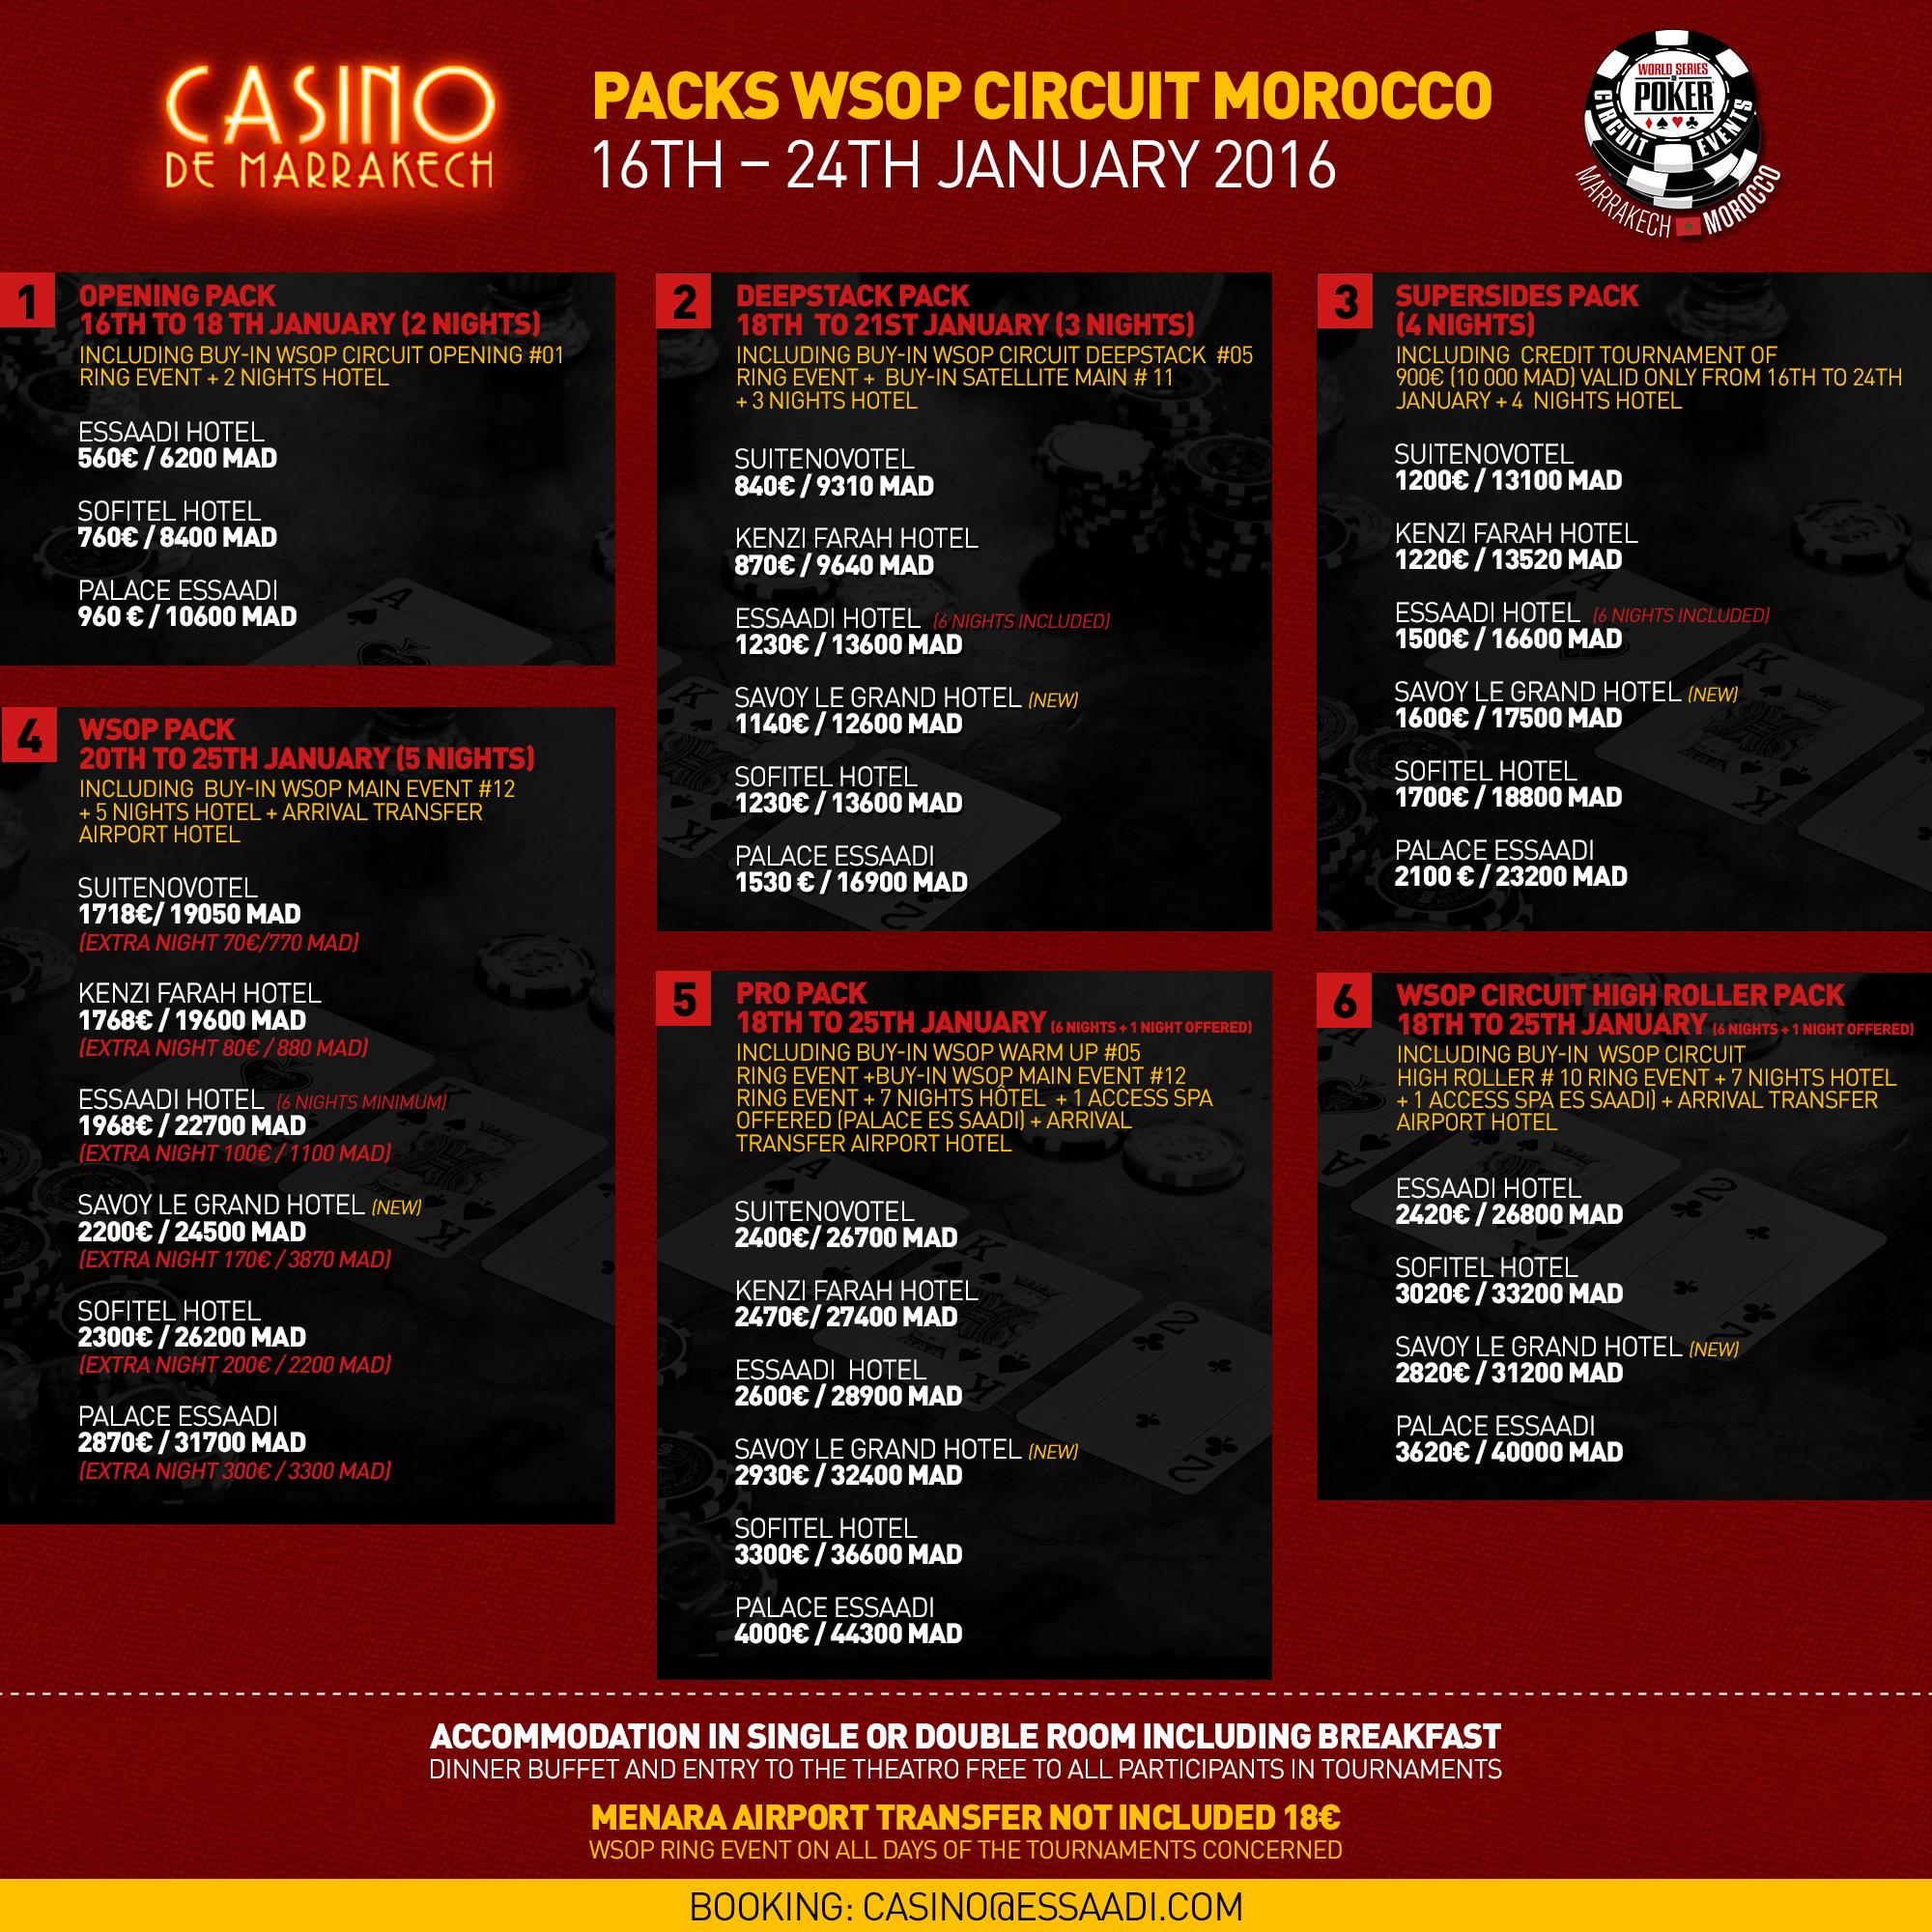 wsop circuit event schedule